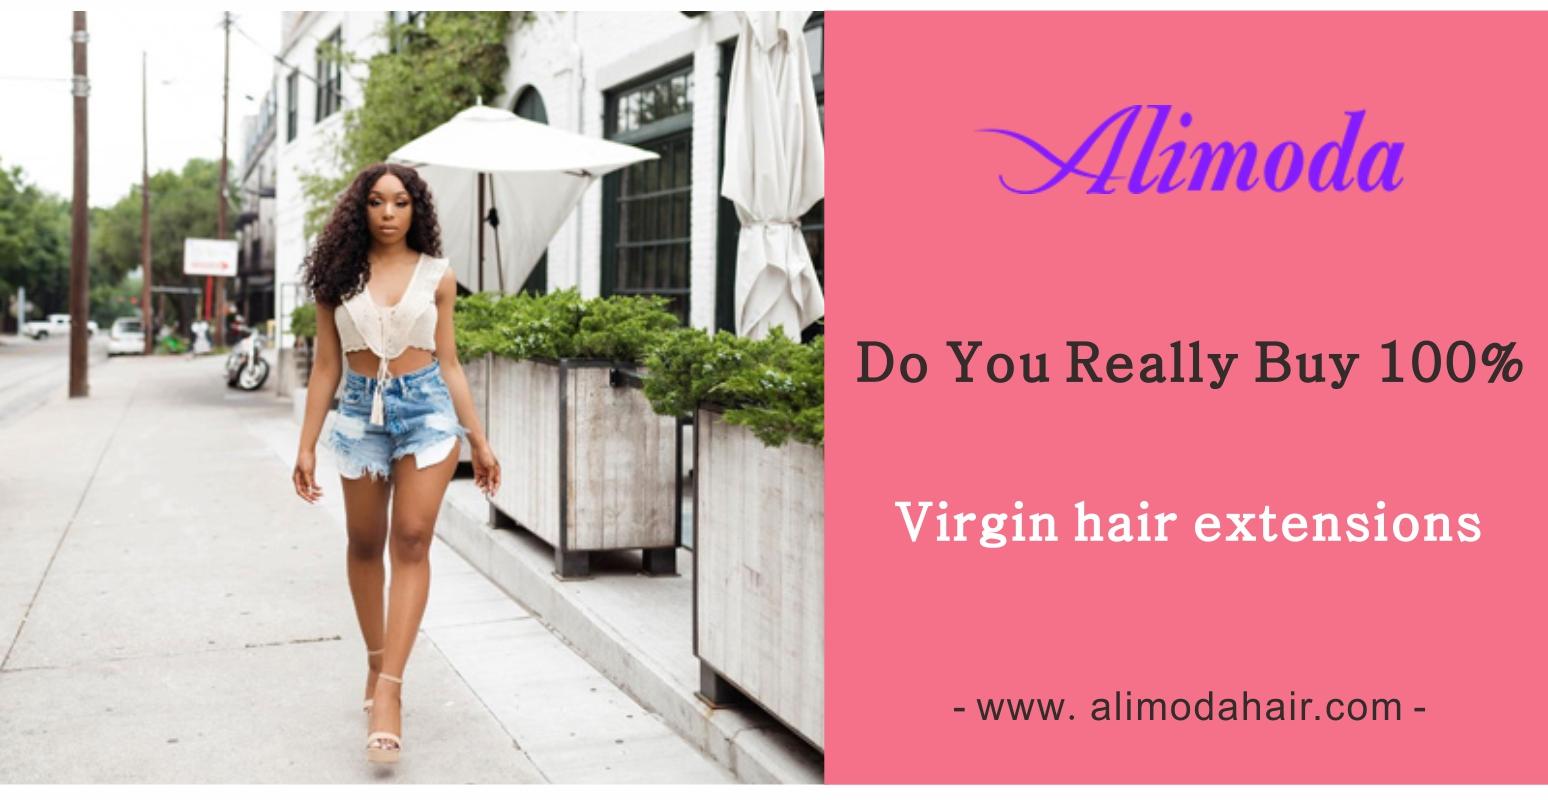 Do you really buy 100% virgin hair extensions?